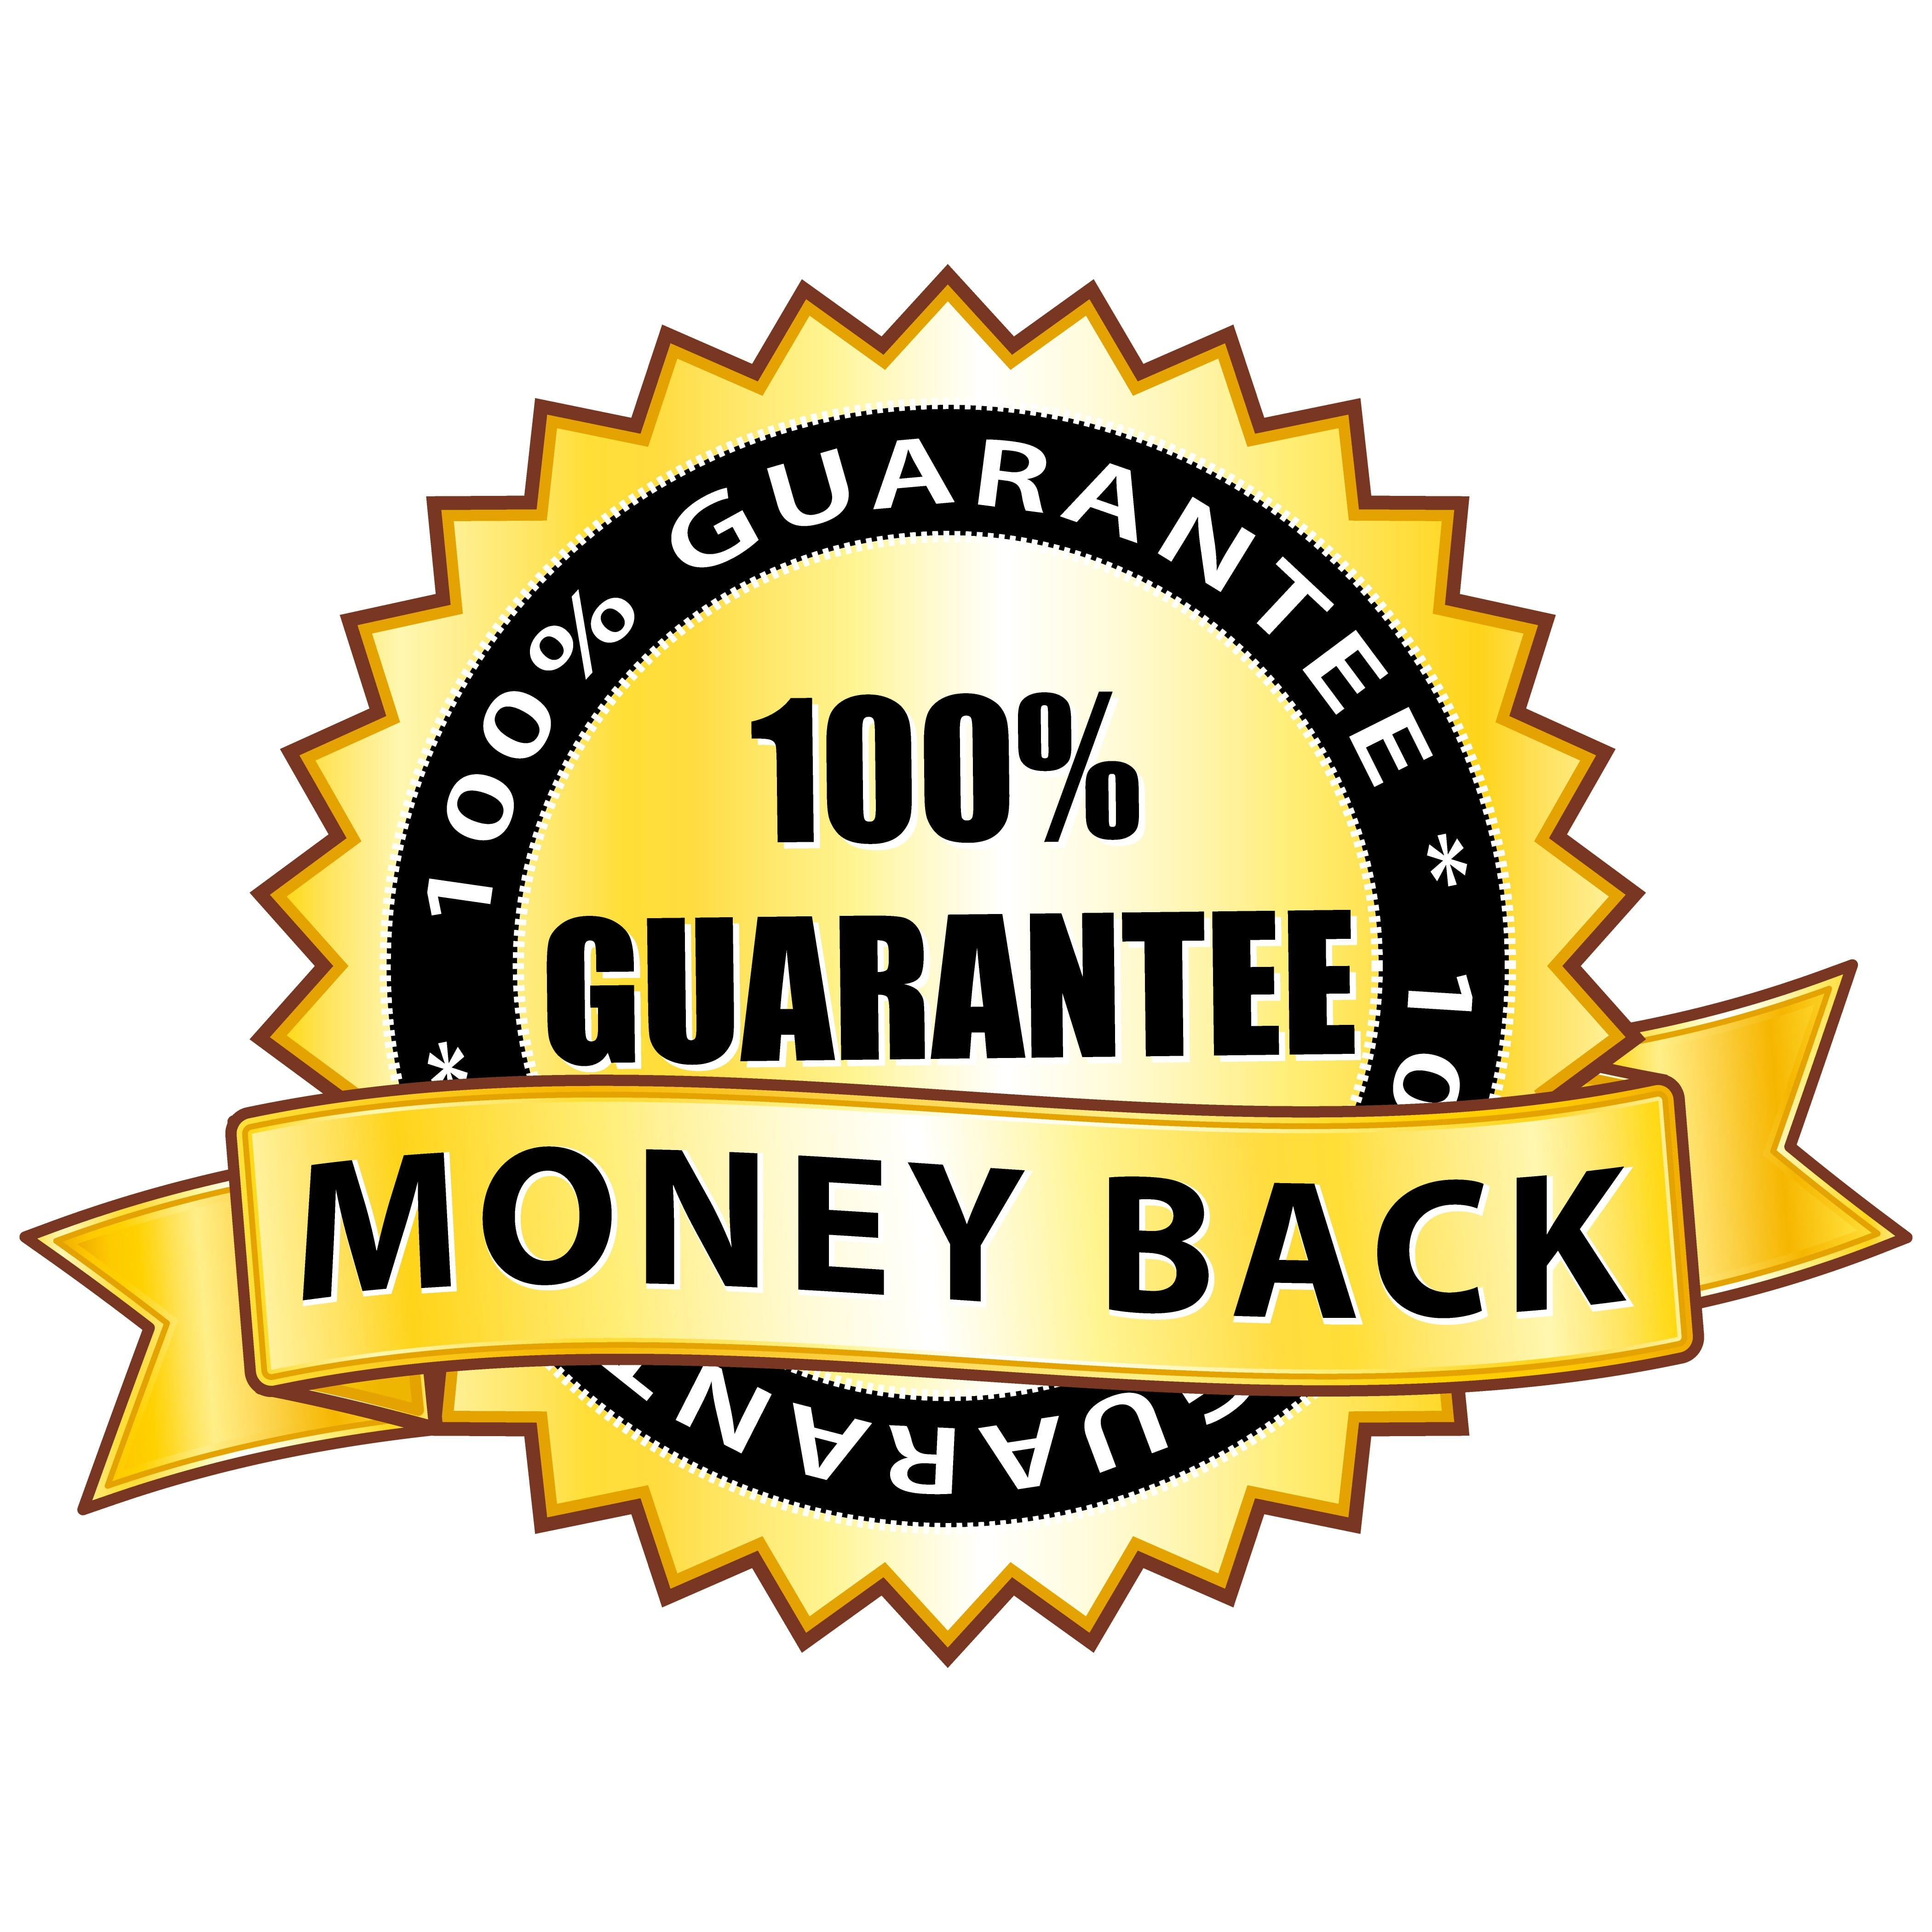 100% Guarantee Money Back